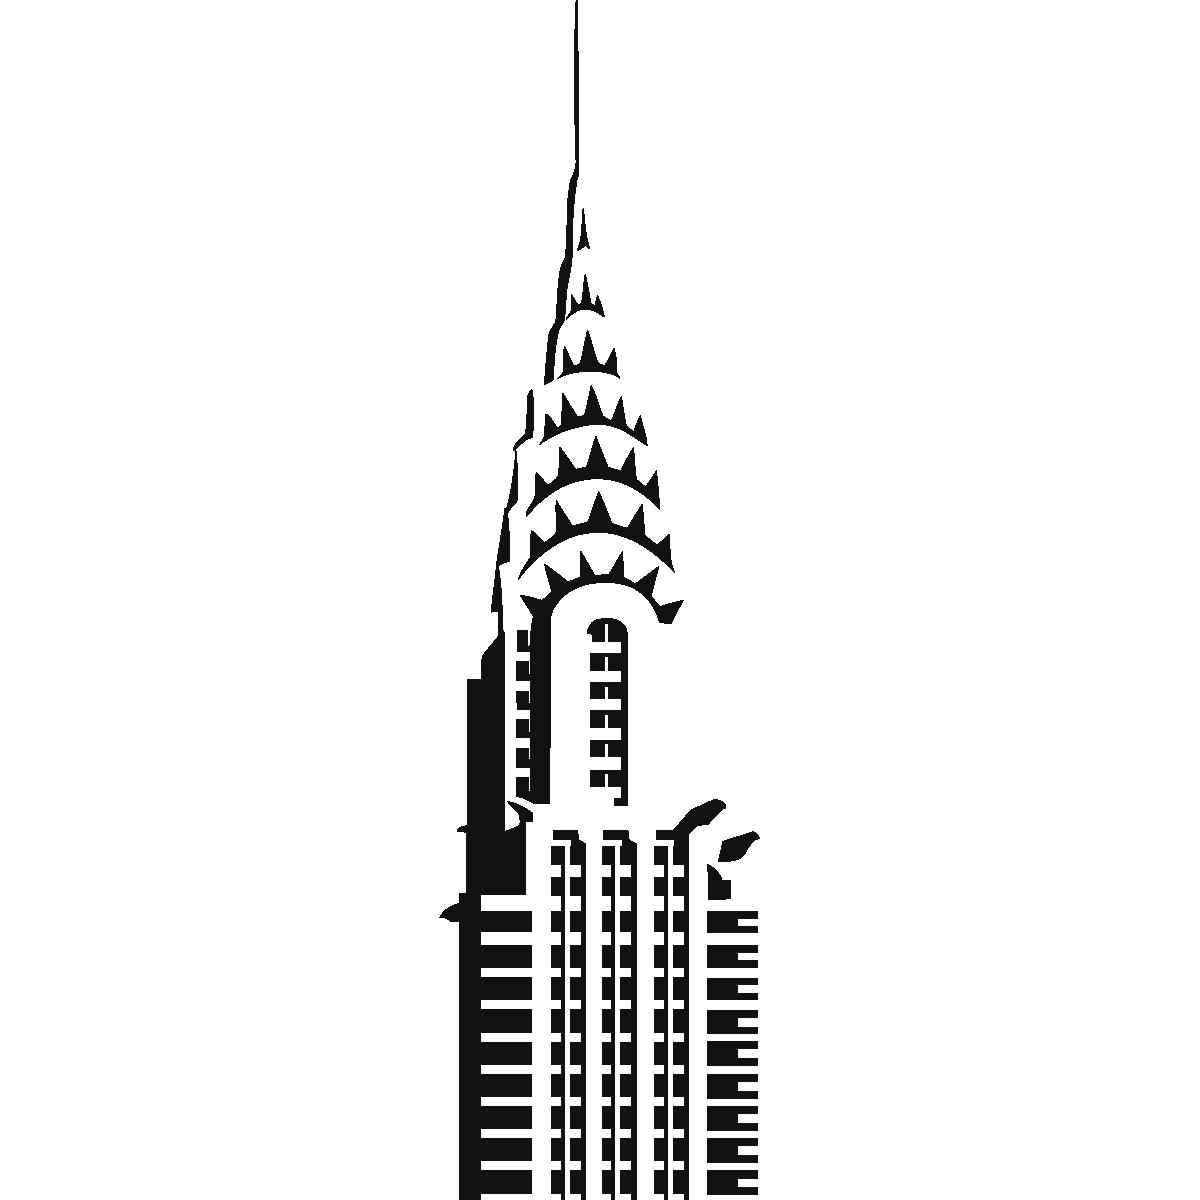 Chrysler Building Vector - ClipArt Best